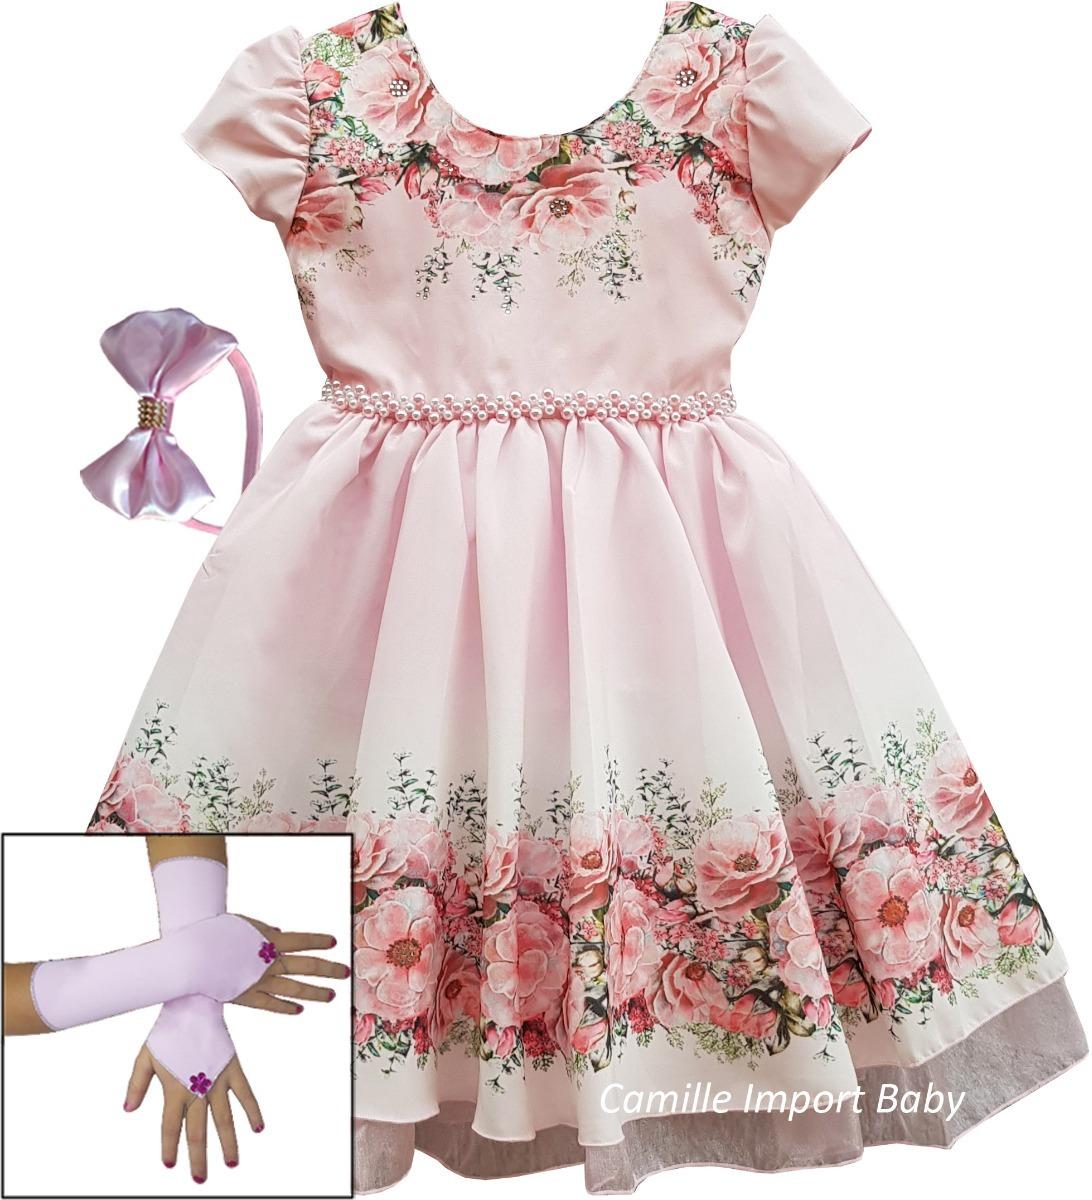 251a09709 vestido festa infantil floral rosa borboletas com tiara. Carregando zoom.